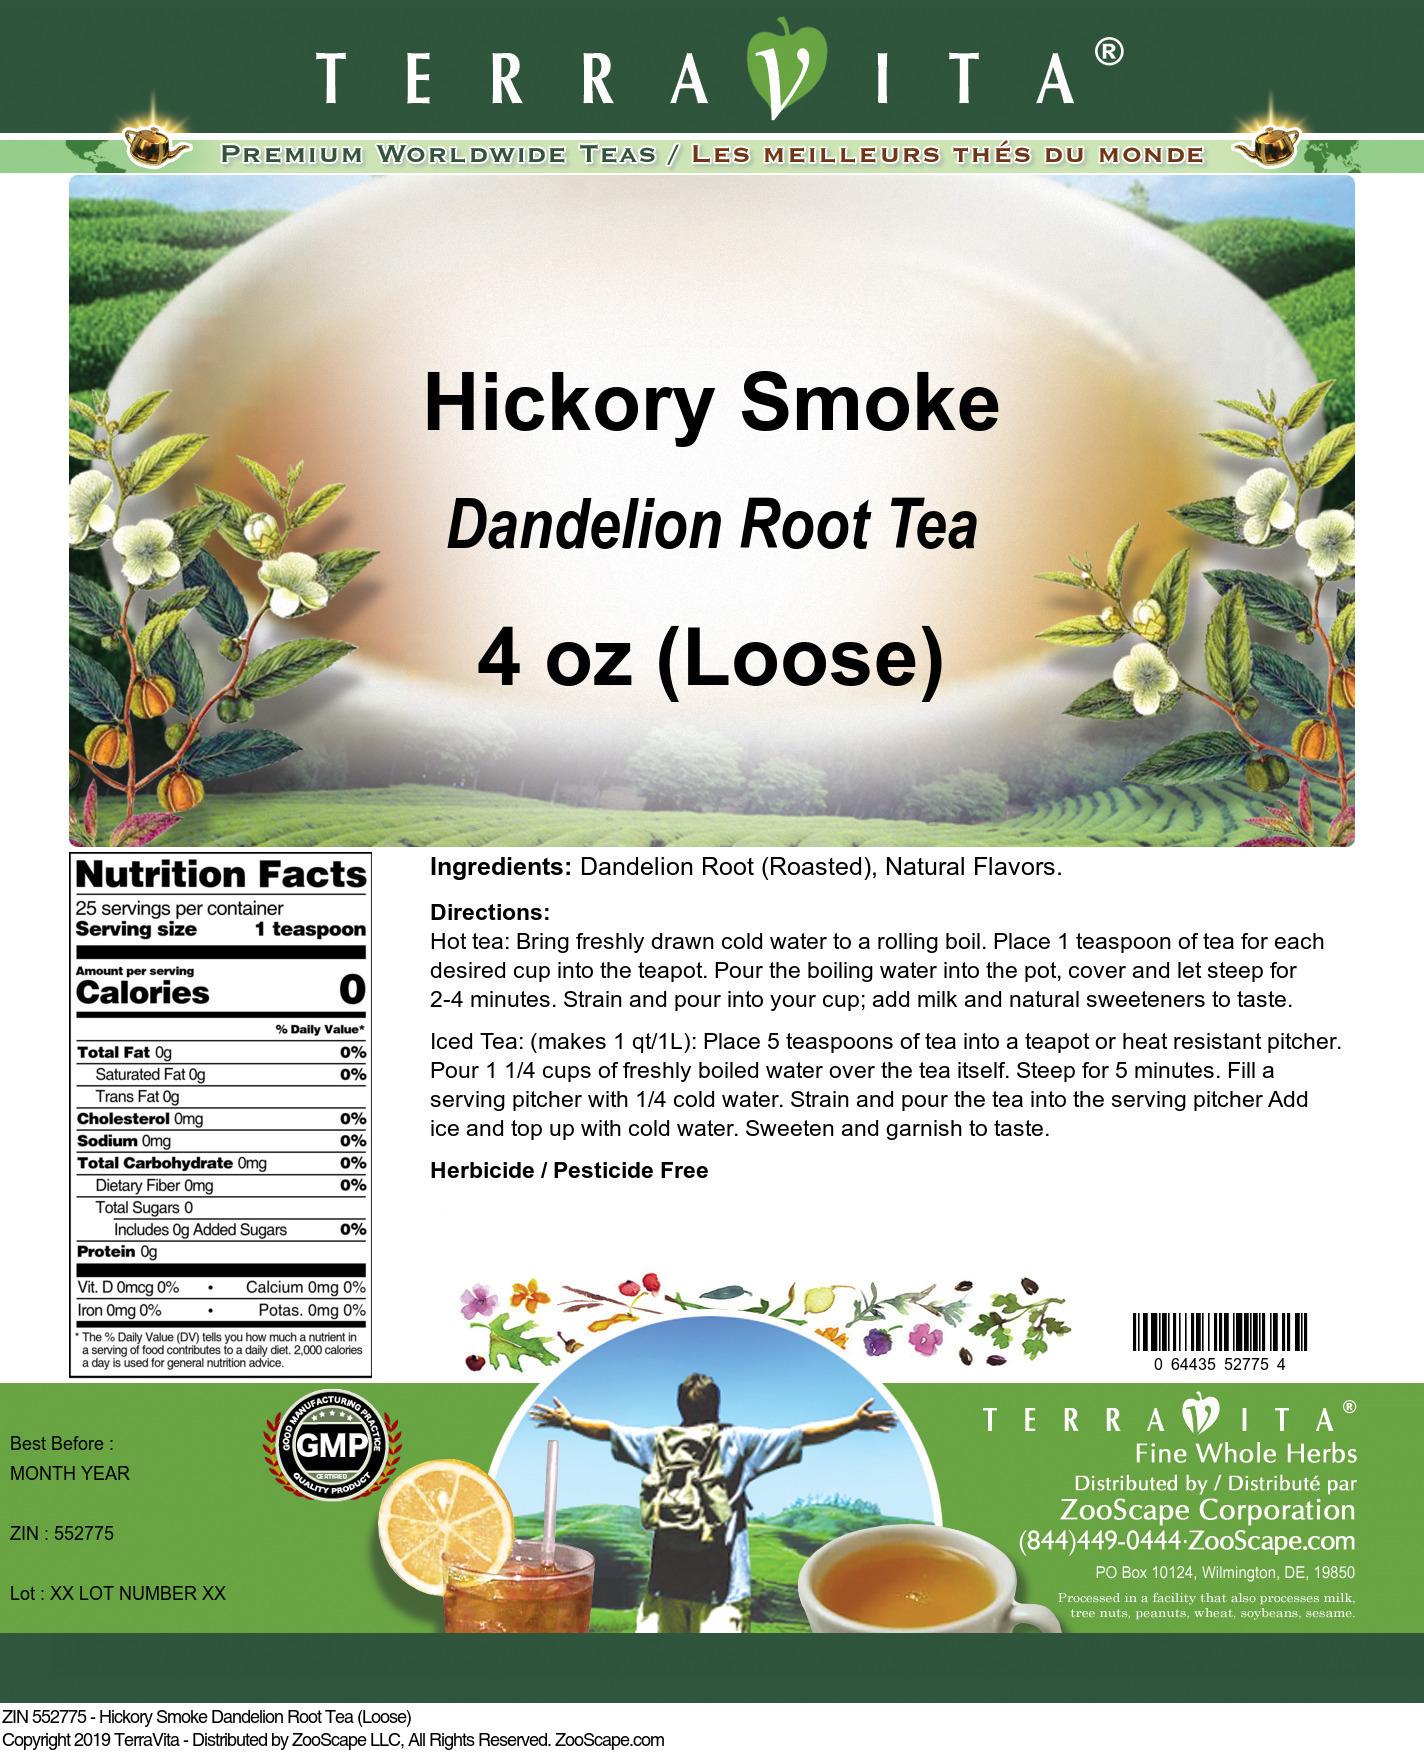 Hickory Smoke Dandelion Root